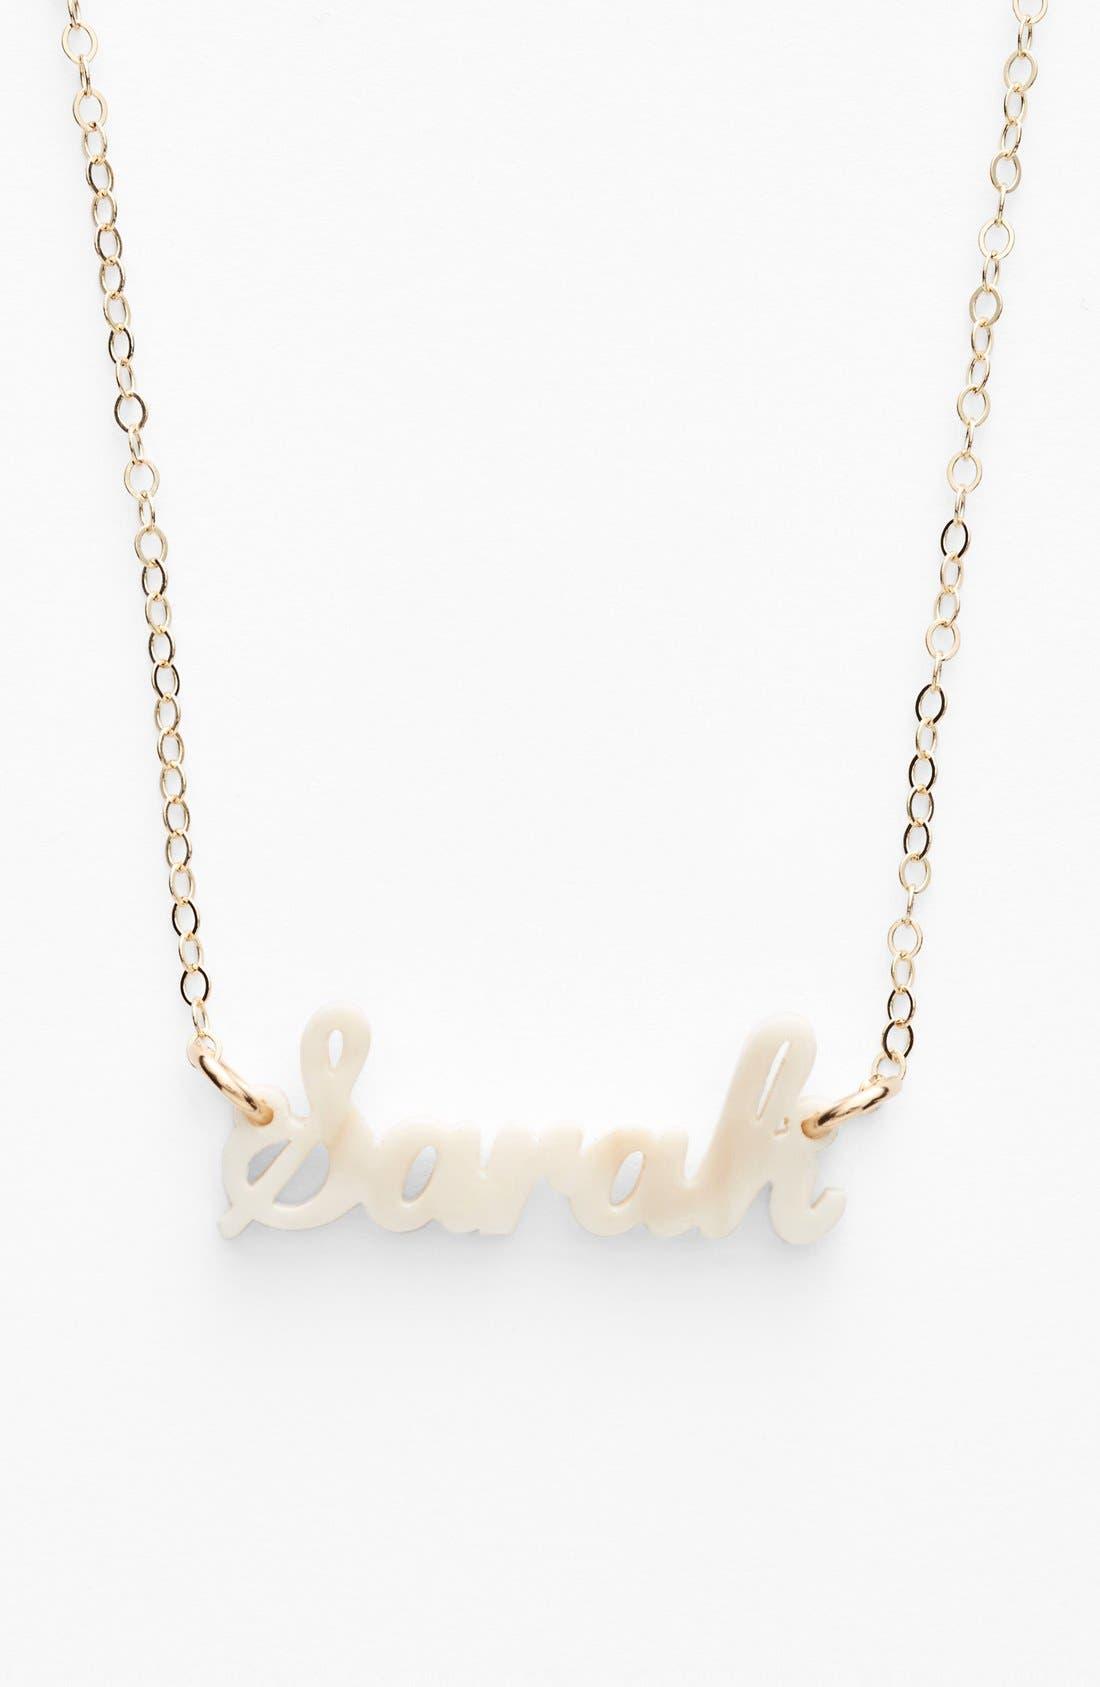 'Script Font' Personalized Nameplate Pendant Necklace,                             Main thumbnail 1, color,                             Blonde Tortoise/ Gold